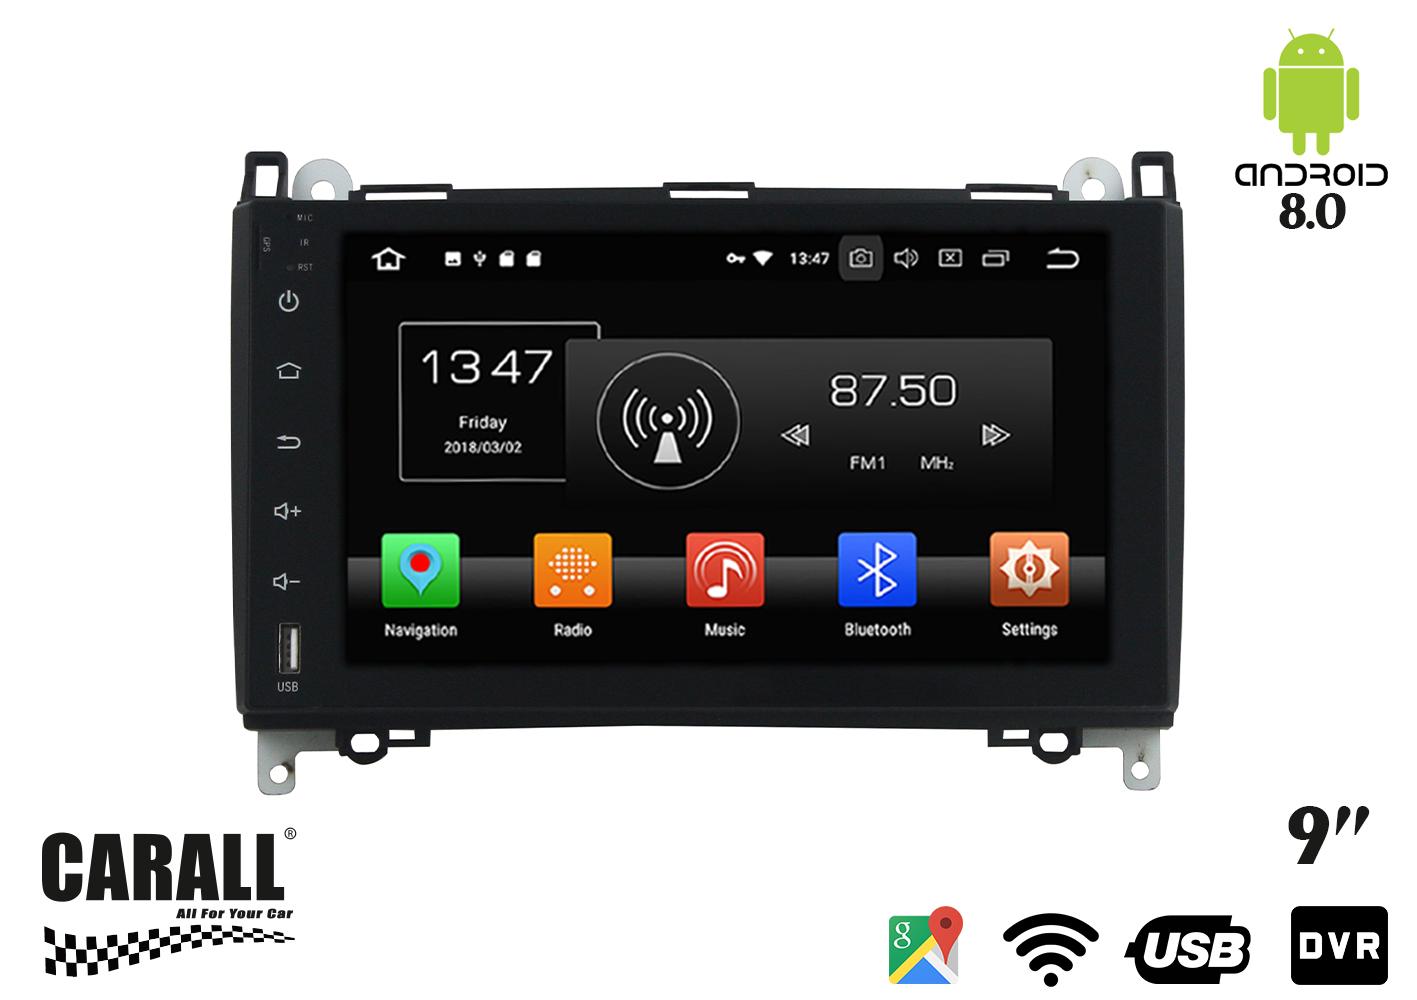 Autoradio Android 8,0 Mercede Benz B200 GPS DVD USB SD WI-FI Bluetooth Navigatore - KIT